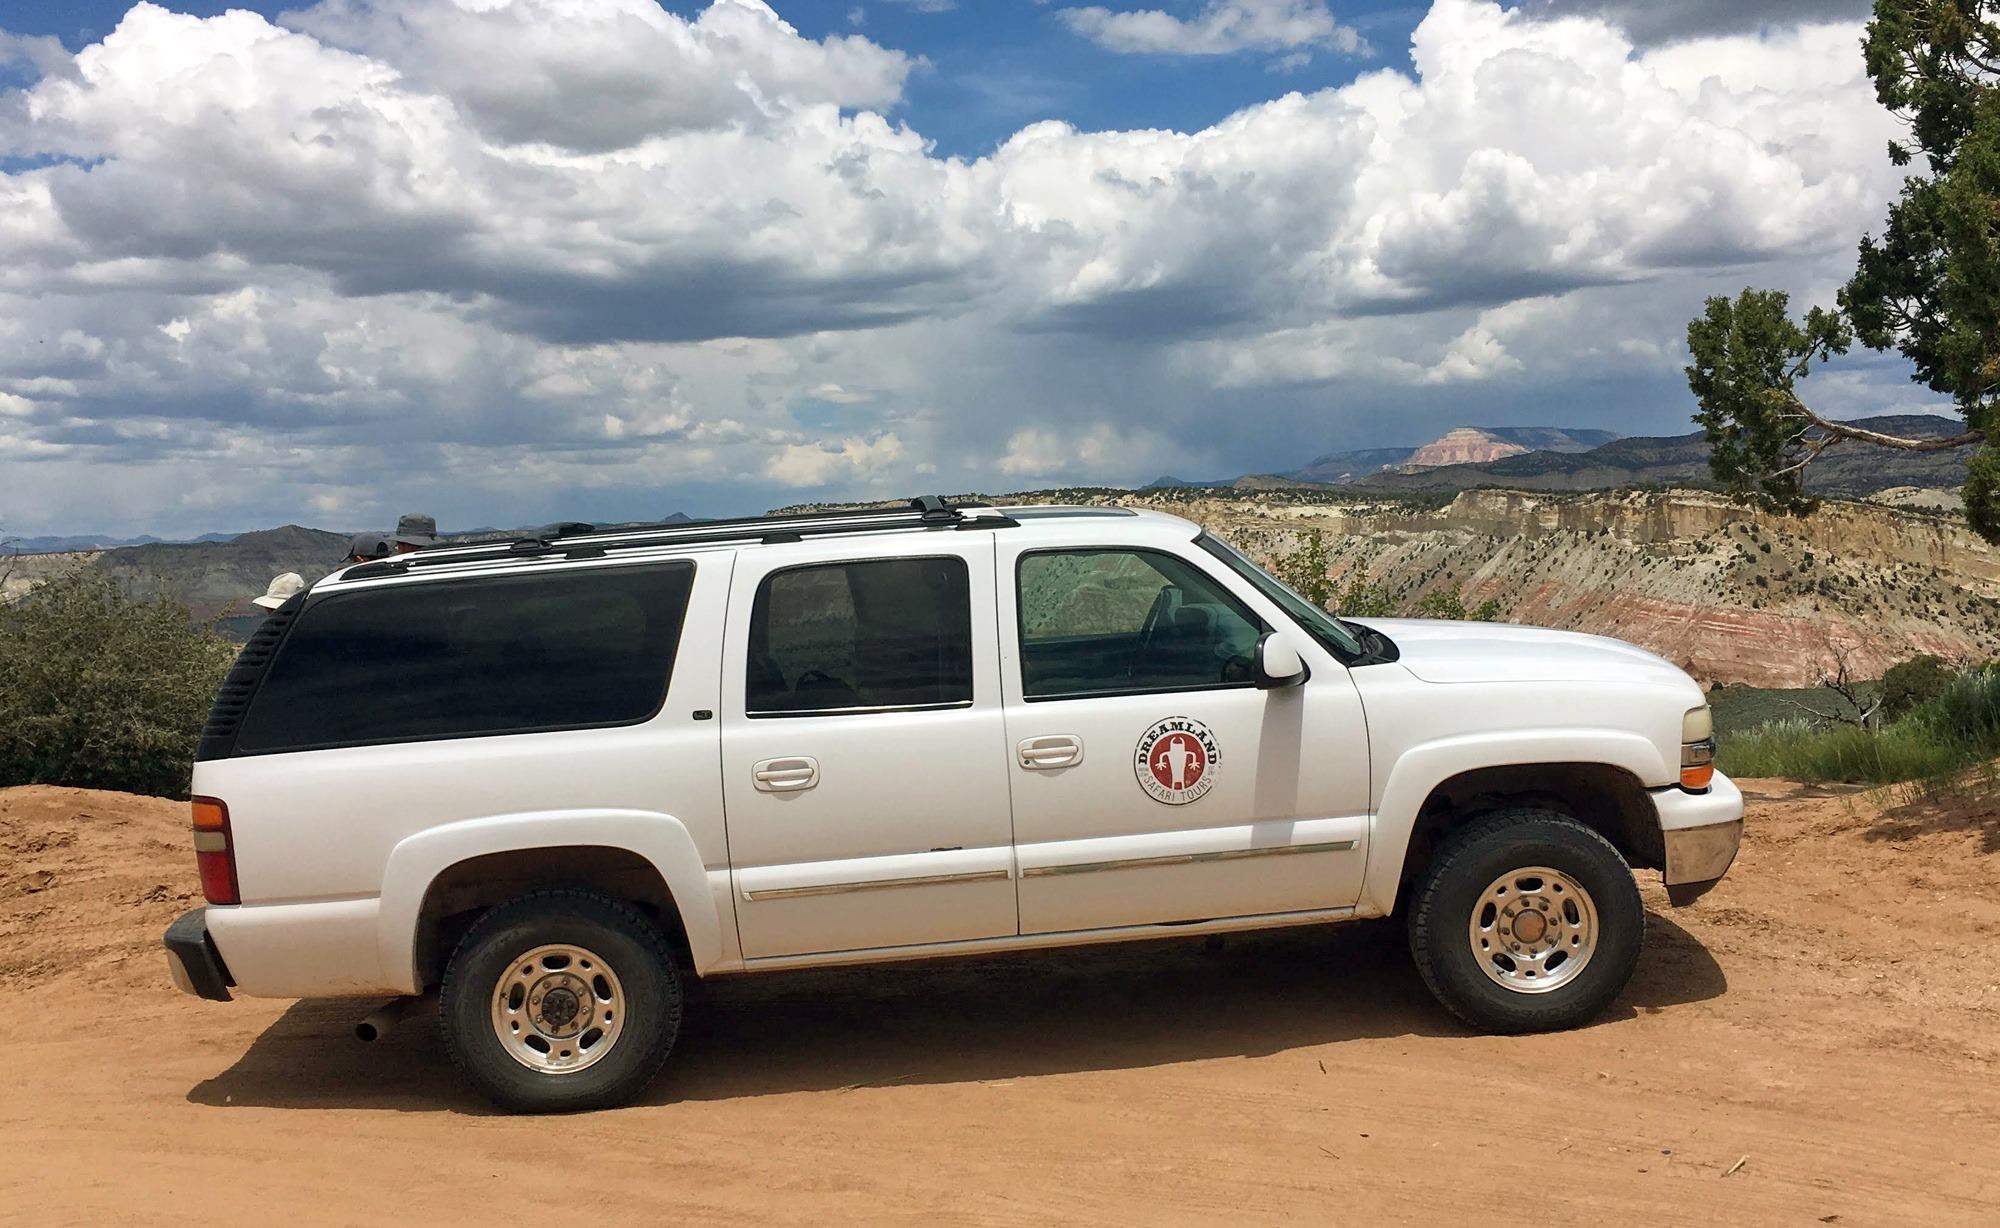 Dreamland Safari Tours truck at Grand Staircase-Escalante National Monument